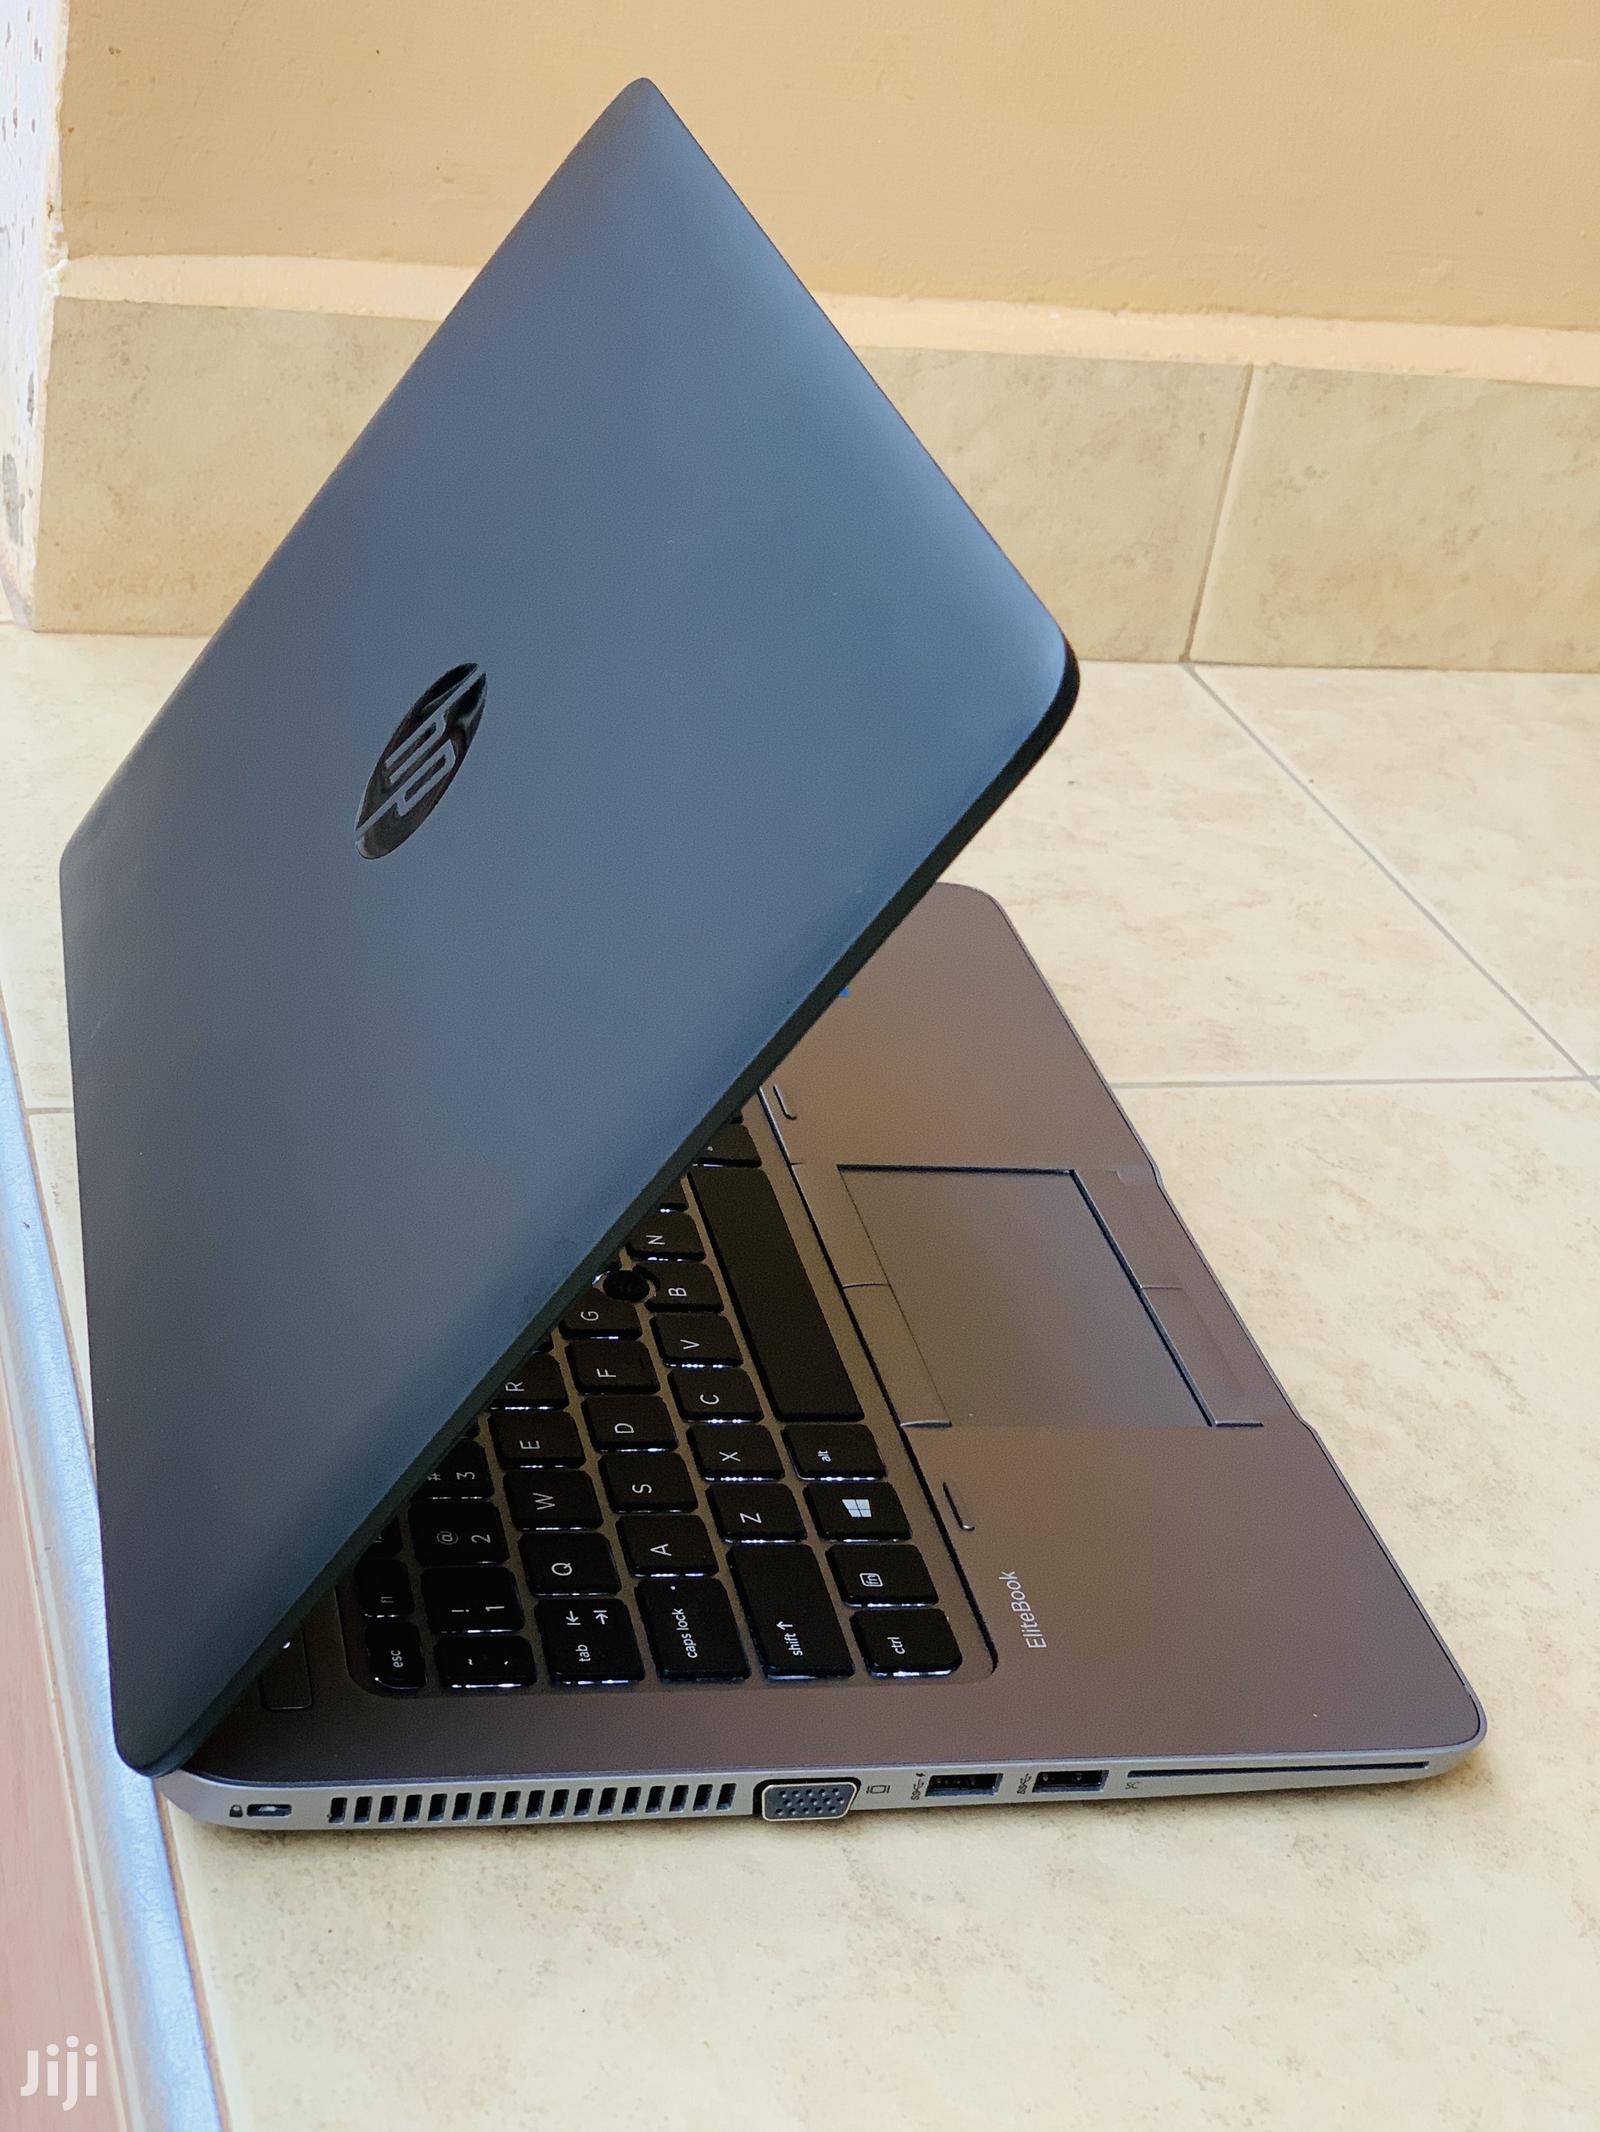 Laptop HP EliteBook 840 G2 4GB Intel Core I5 HDD 500GB   Laptops & Computers for sale in Kampala, Central Region, Uganda